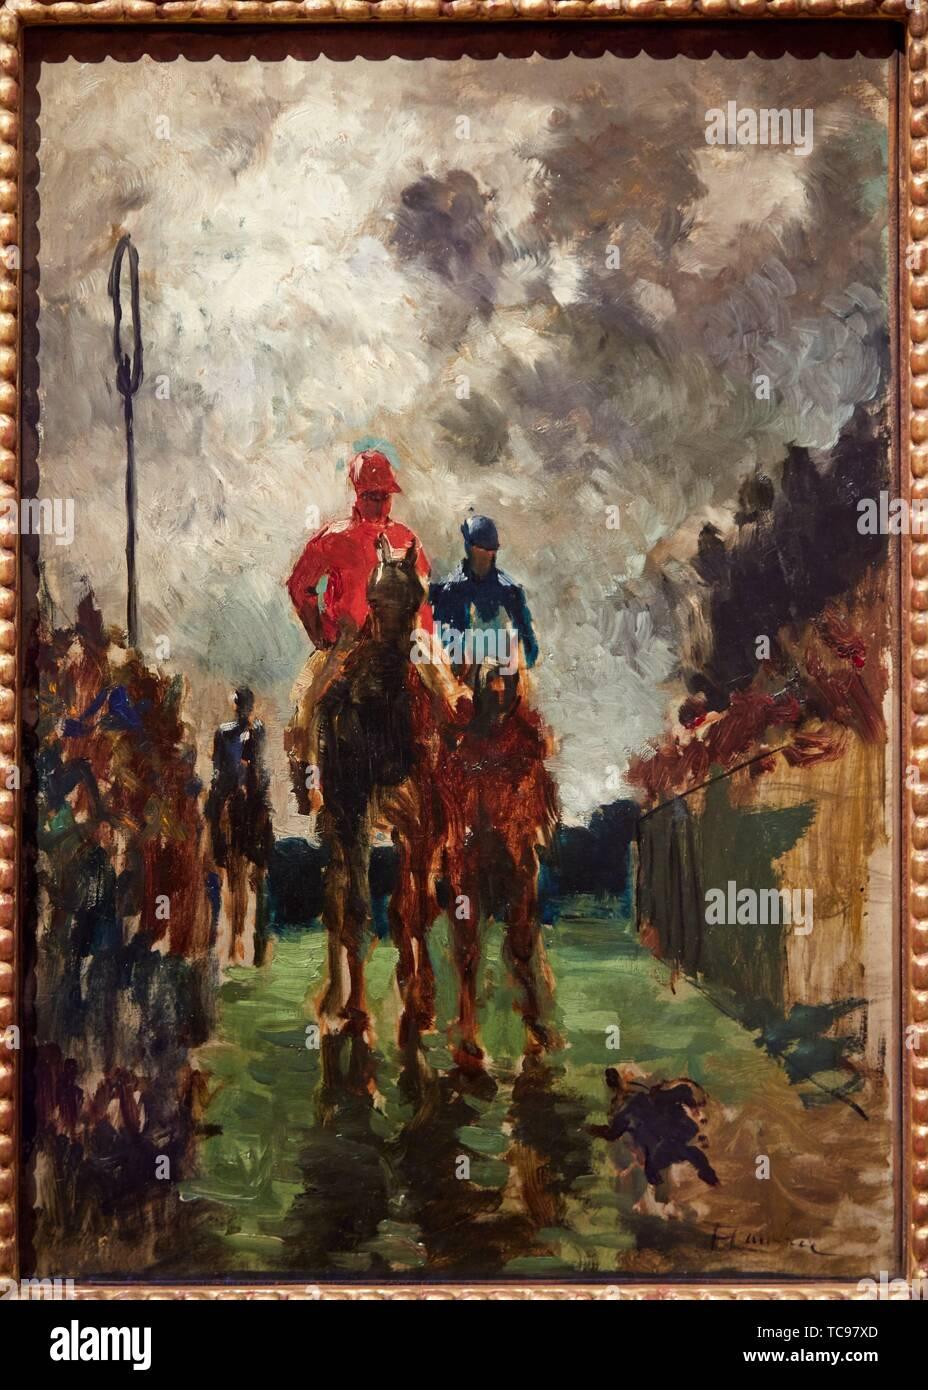 "'''I Fantini"", 1882, Henri de Toulouse-Lautrec, Museo Thyssen Bornemisza, Madrid, Spagna, Europa Foto Stock"